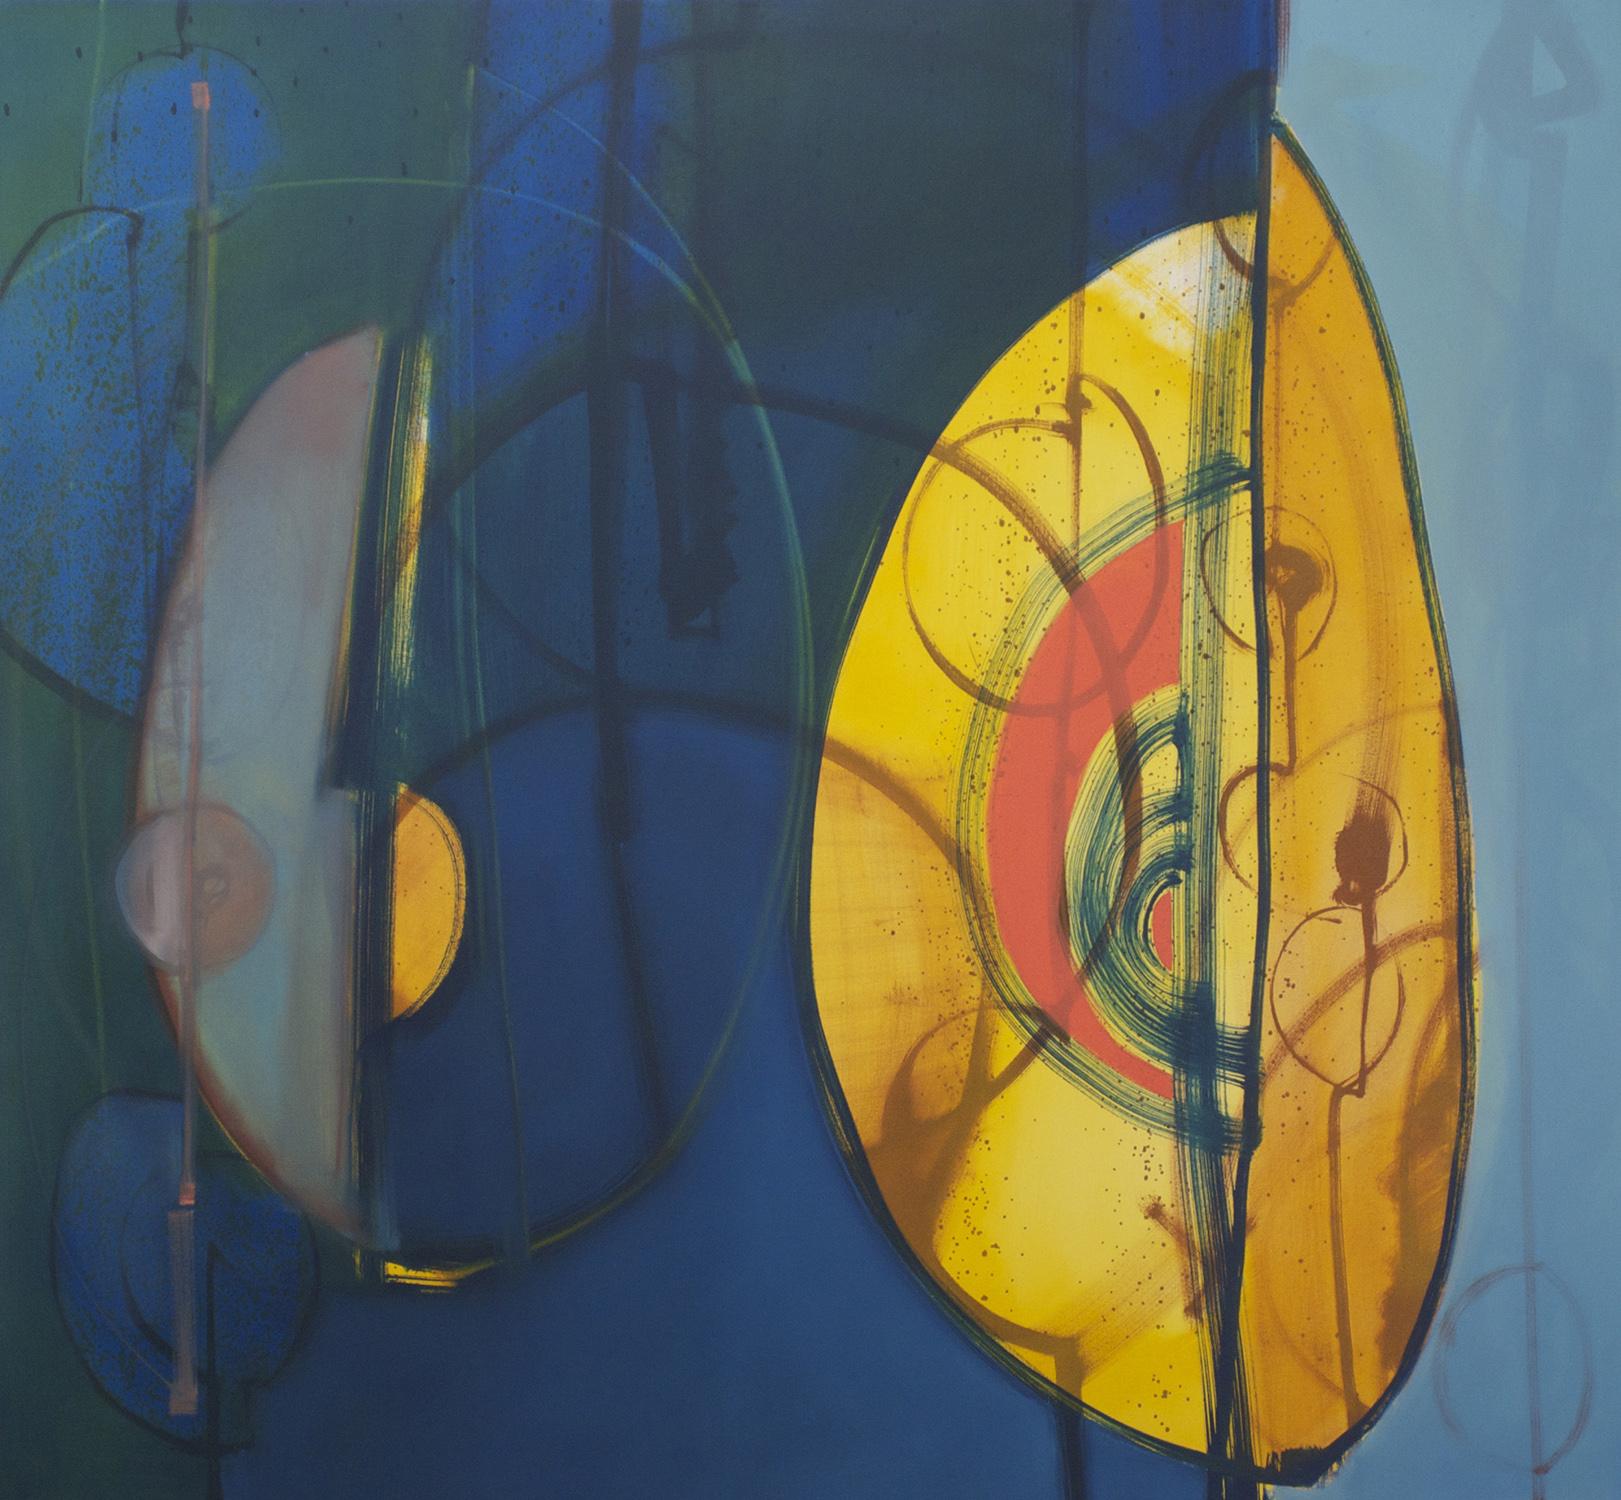 Verna Vogel, Augury #2, oil on canvas, 57 x 61 in.